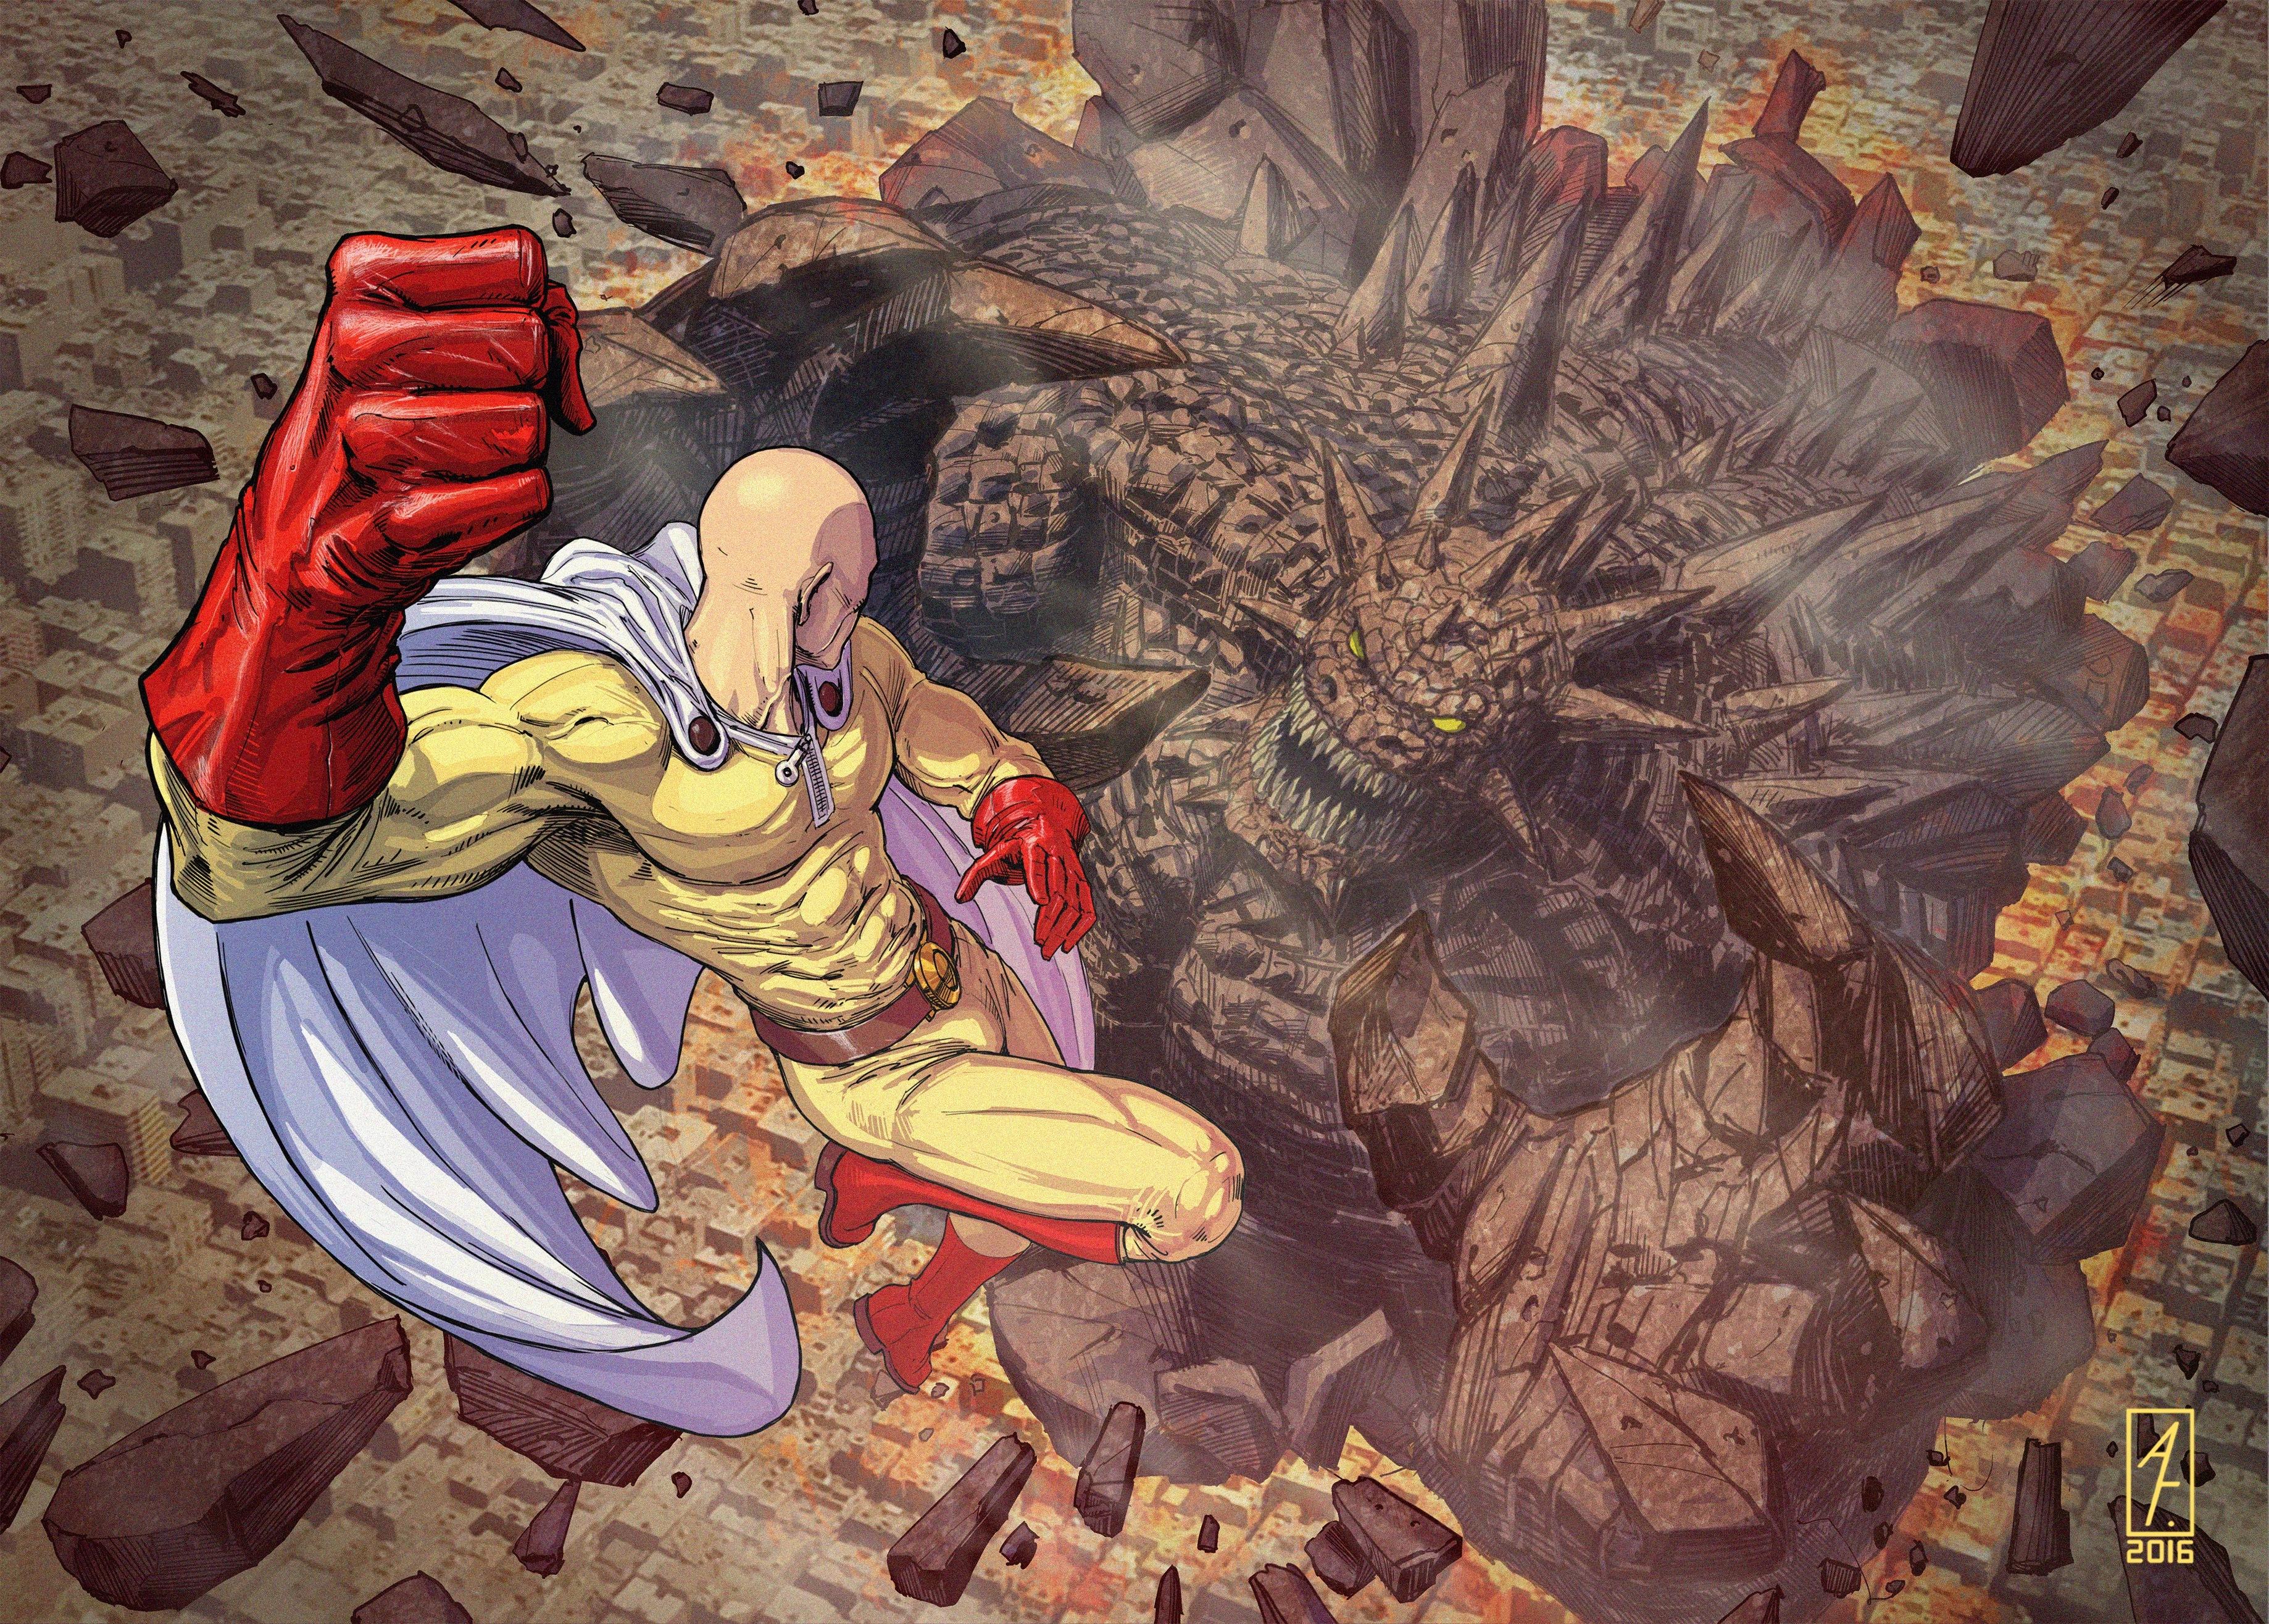 Zerochan anime image gallery for saitama (one punch man), mobile wallpaper. Saitama One Punch Man 4k, HD Anime, 4k Wallpapers, Images ...